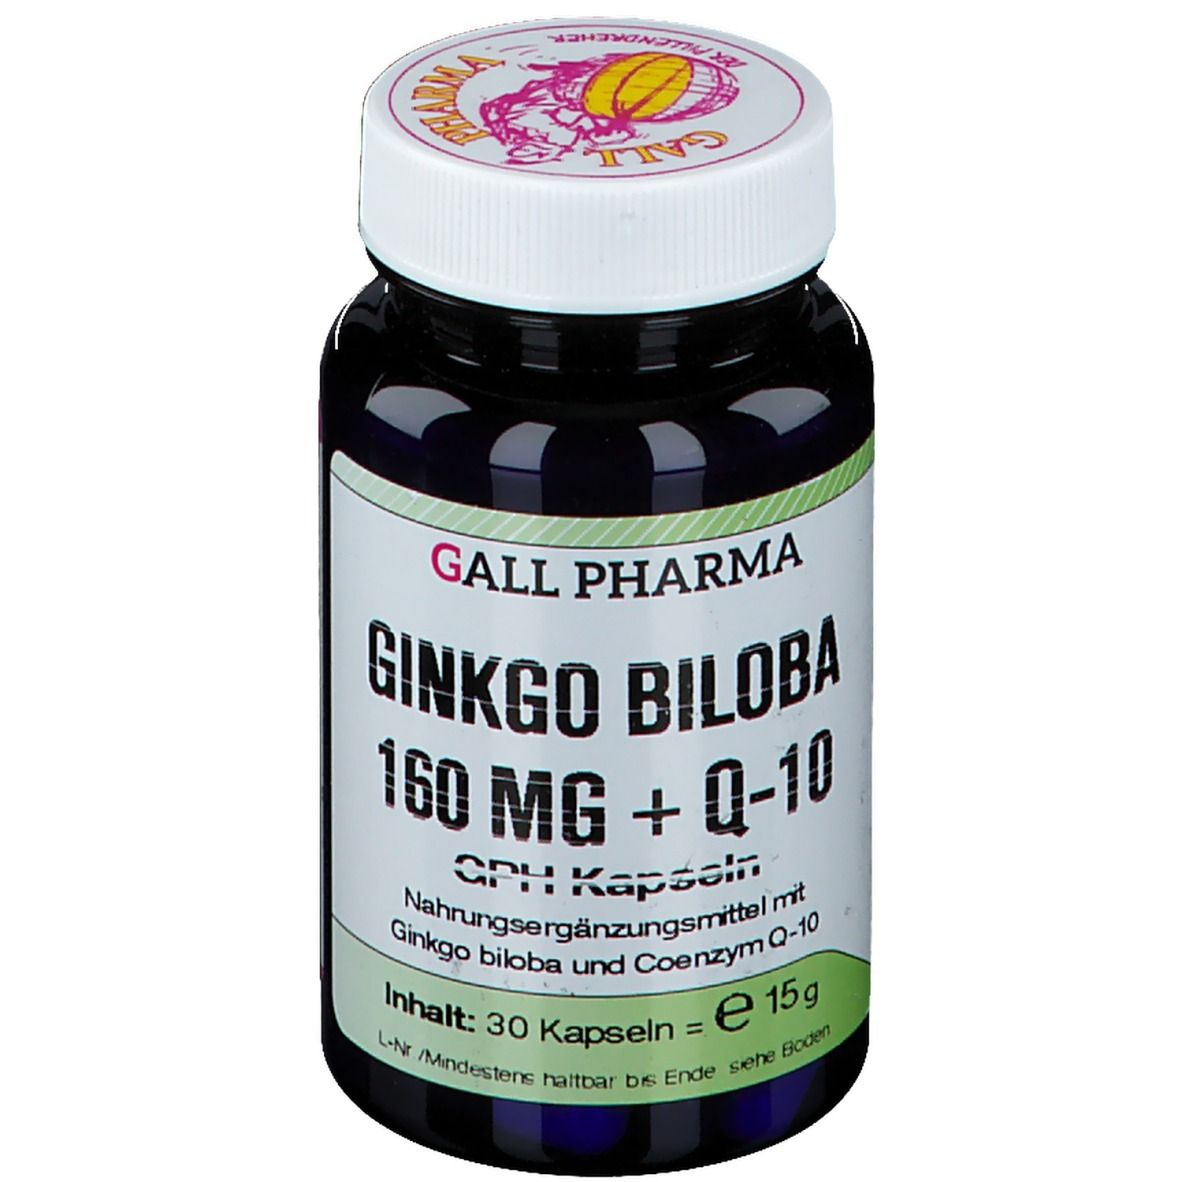 GALL PHARMA Ginkgo Biloba 160 mg + Q-10 GPH